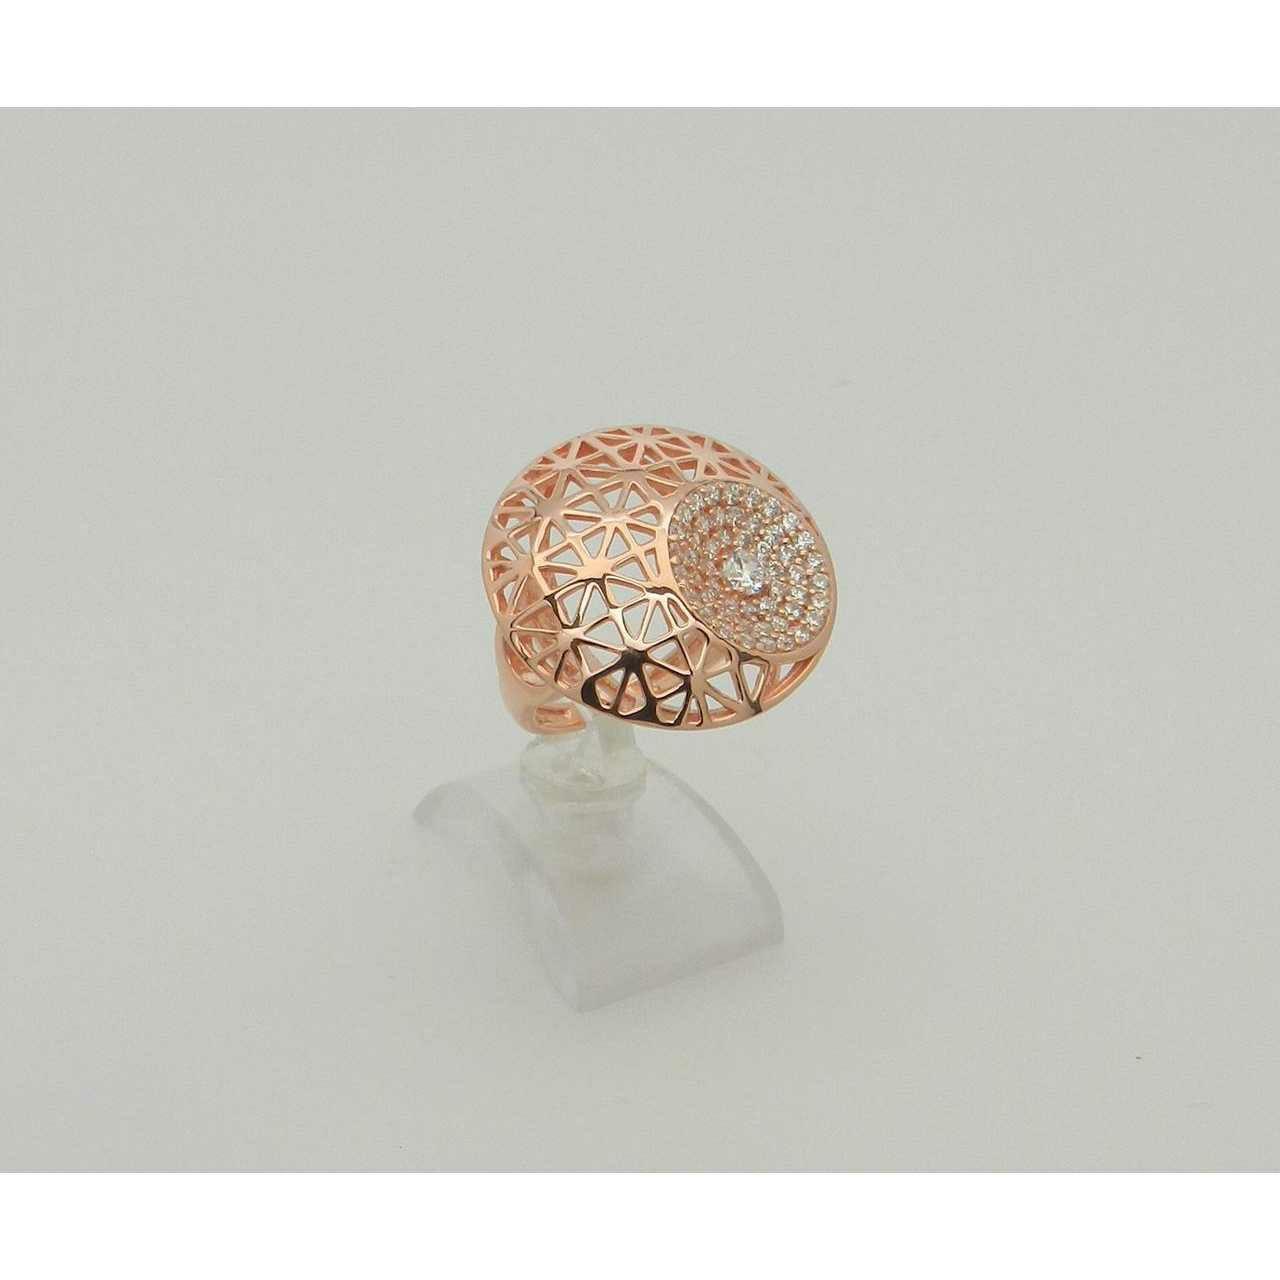 92.5 Gold Finish Premium Ring Ms-4051